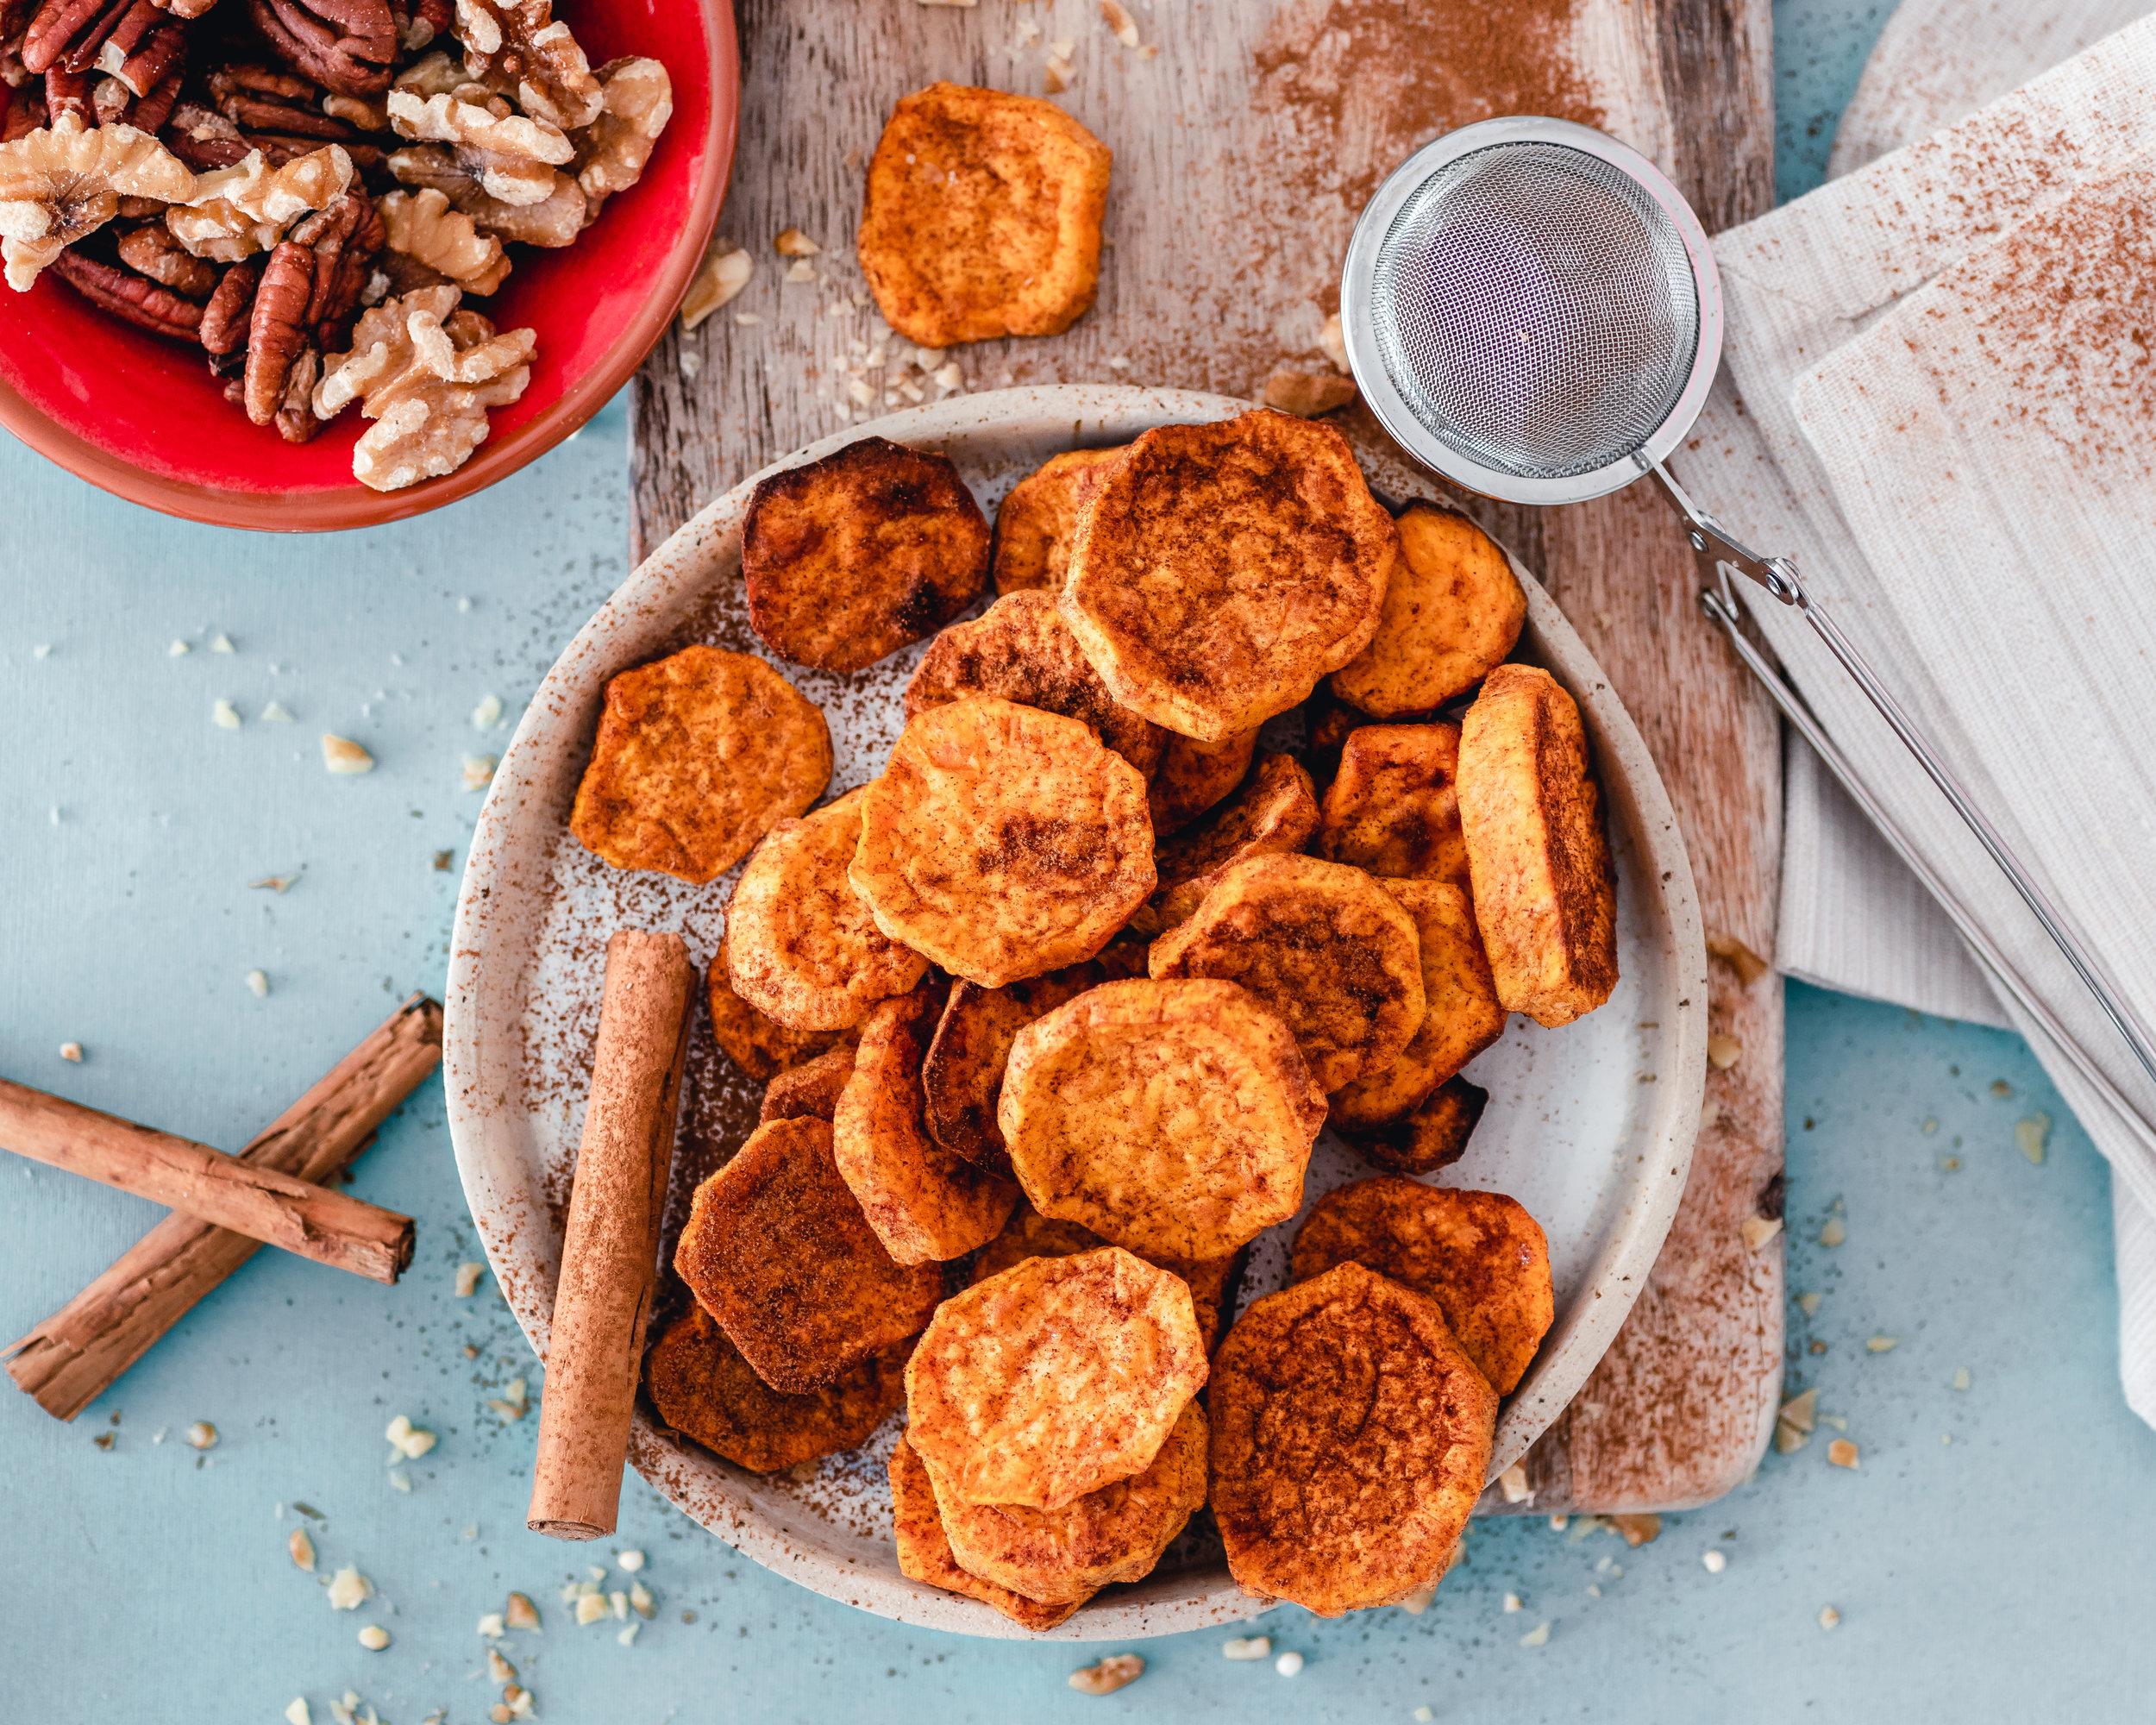 mmm, sweet potatoes